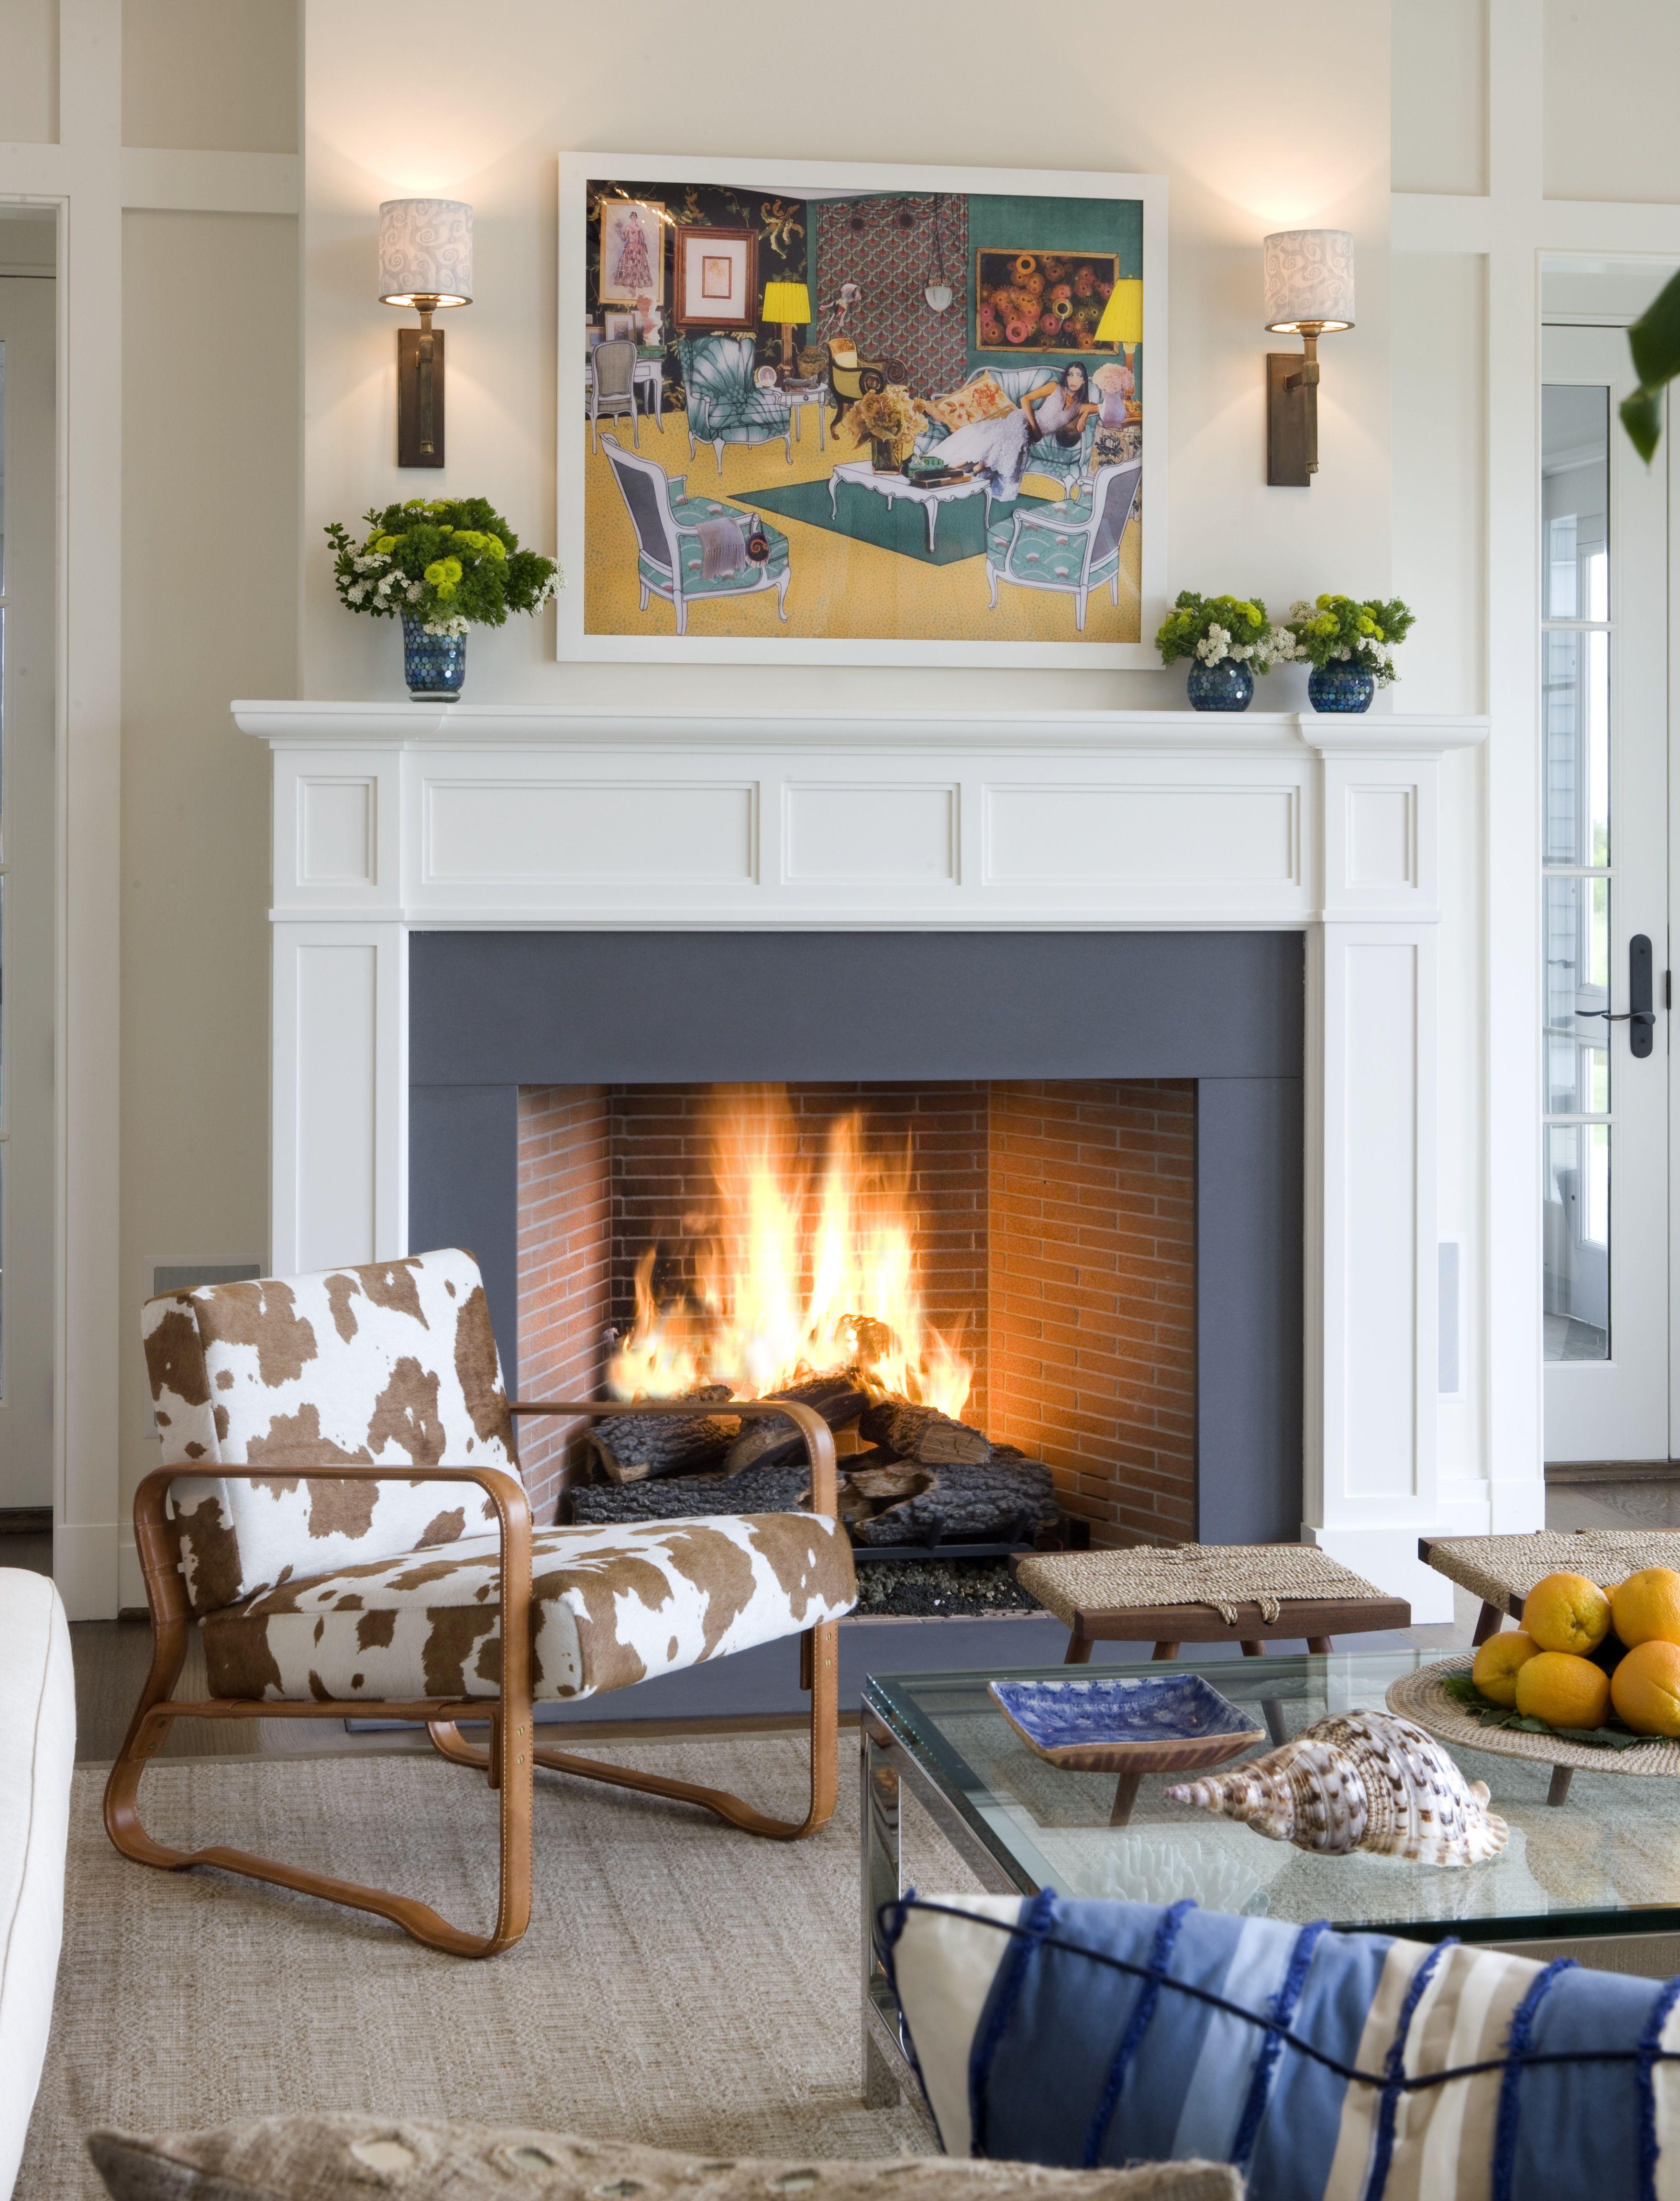 Interior Design Living Room Fireplace Cow hide